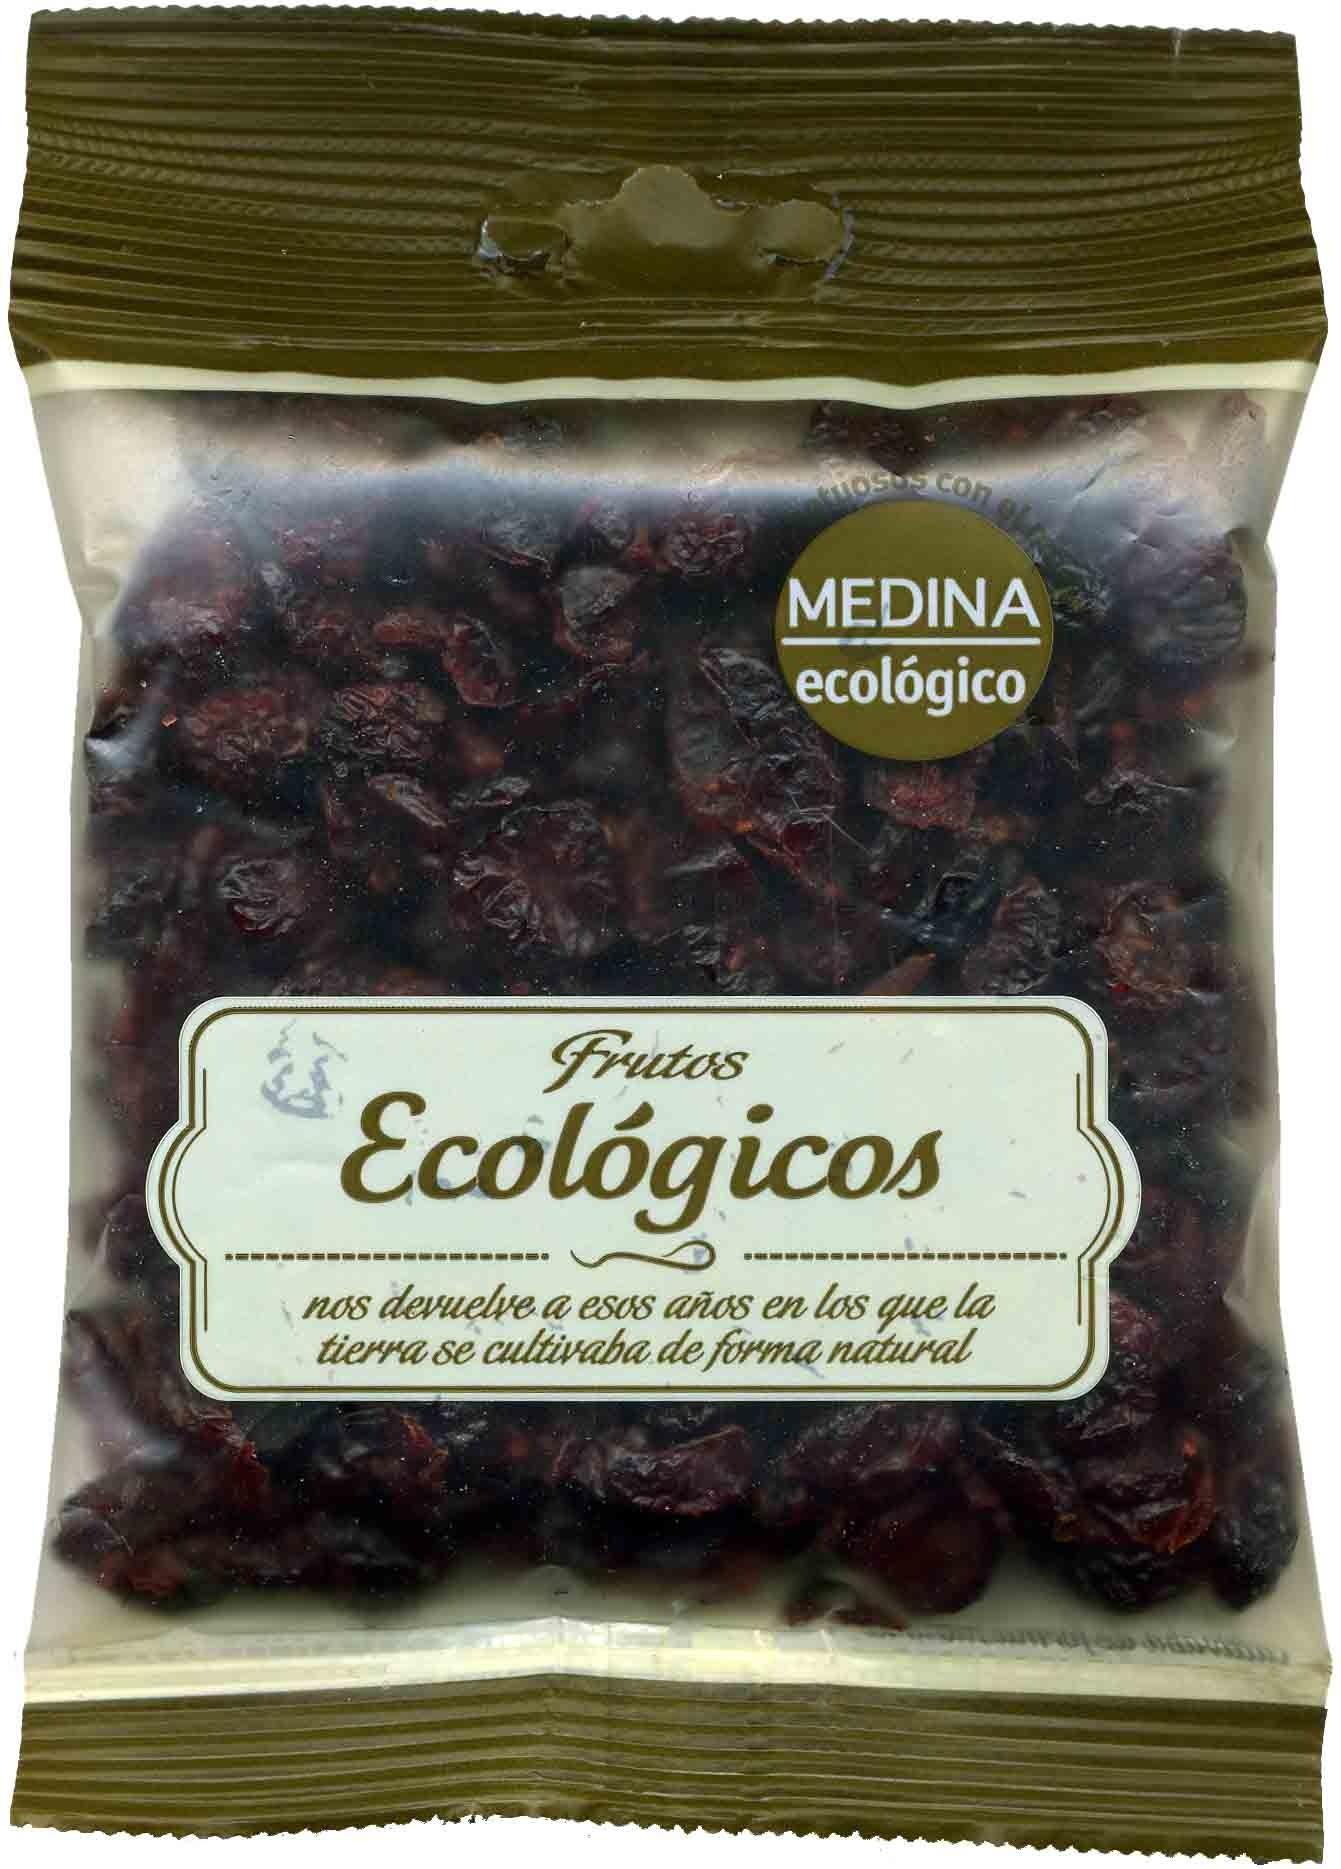 Frutas ecológicas crudos (arándanos) - Produit - es